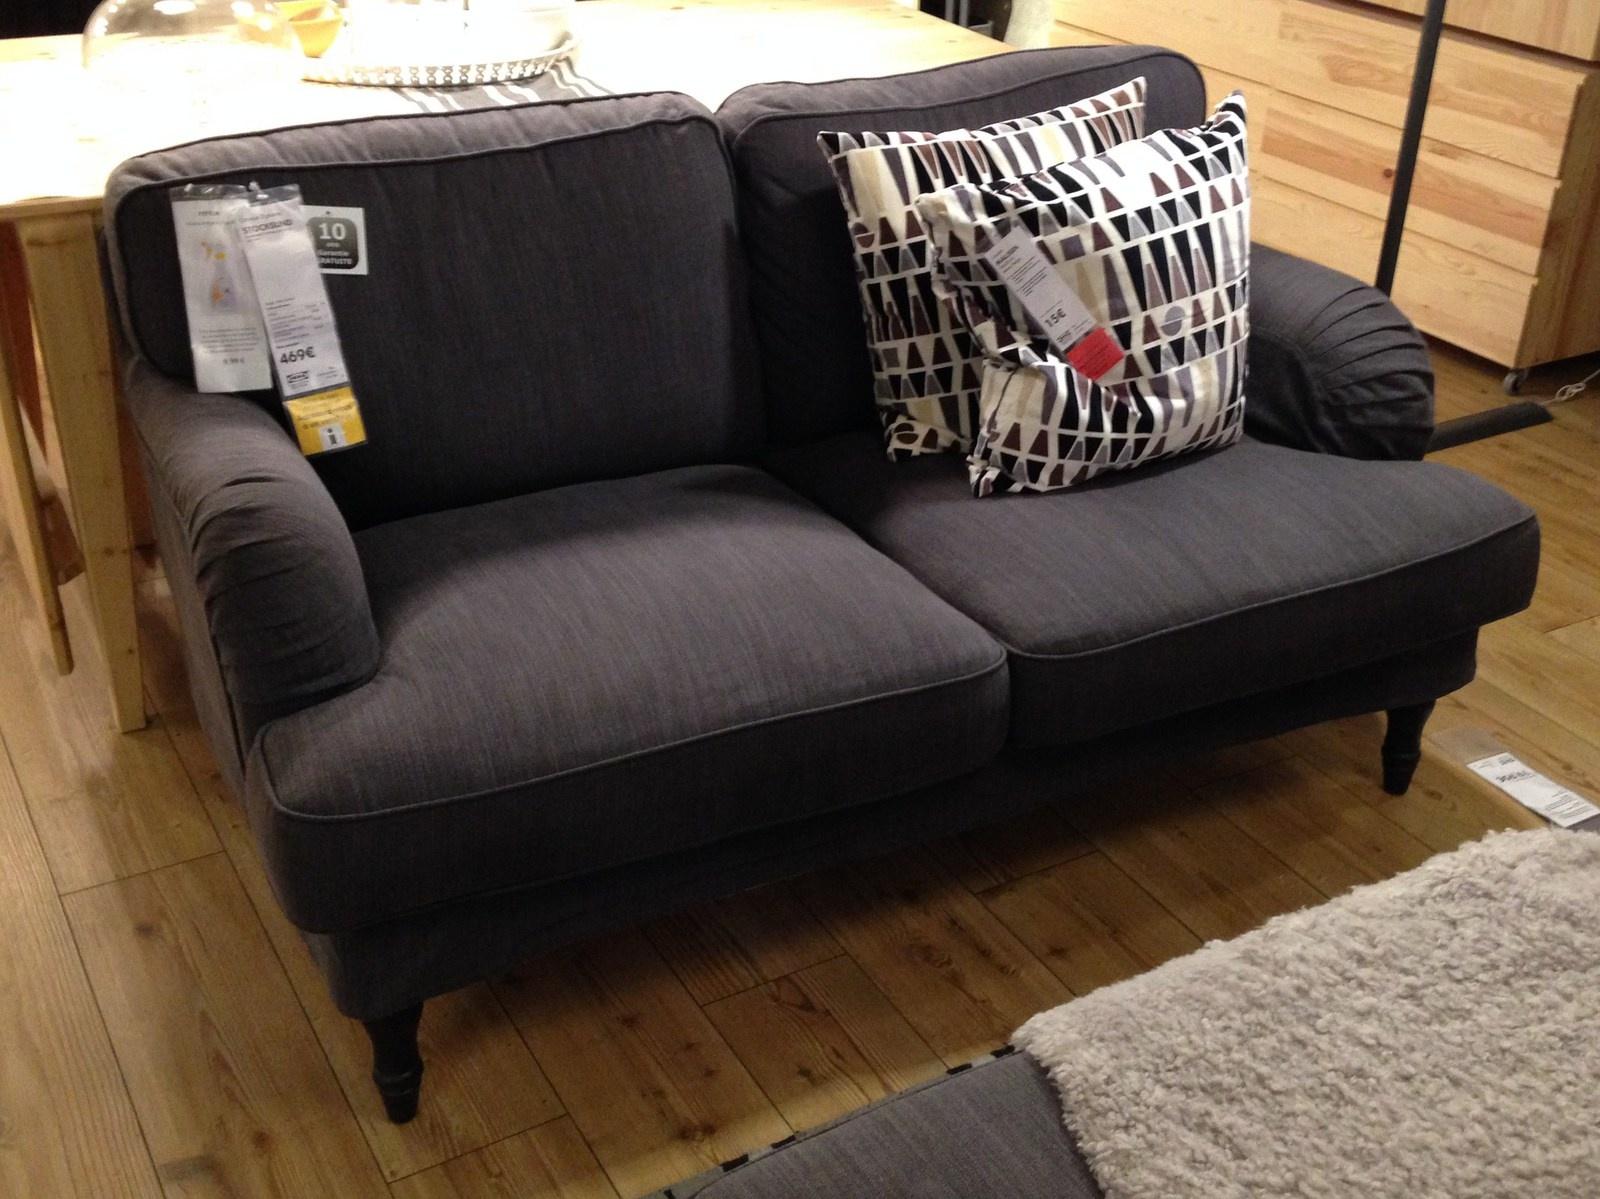 Canapé Ikea Convertible Angle Luxe Image Ikea Salon En Cuir